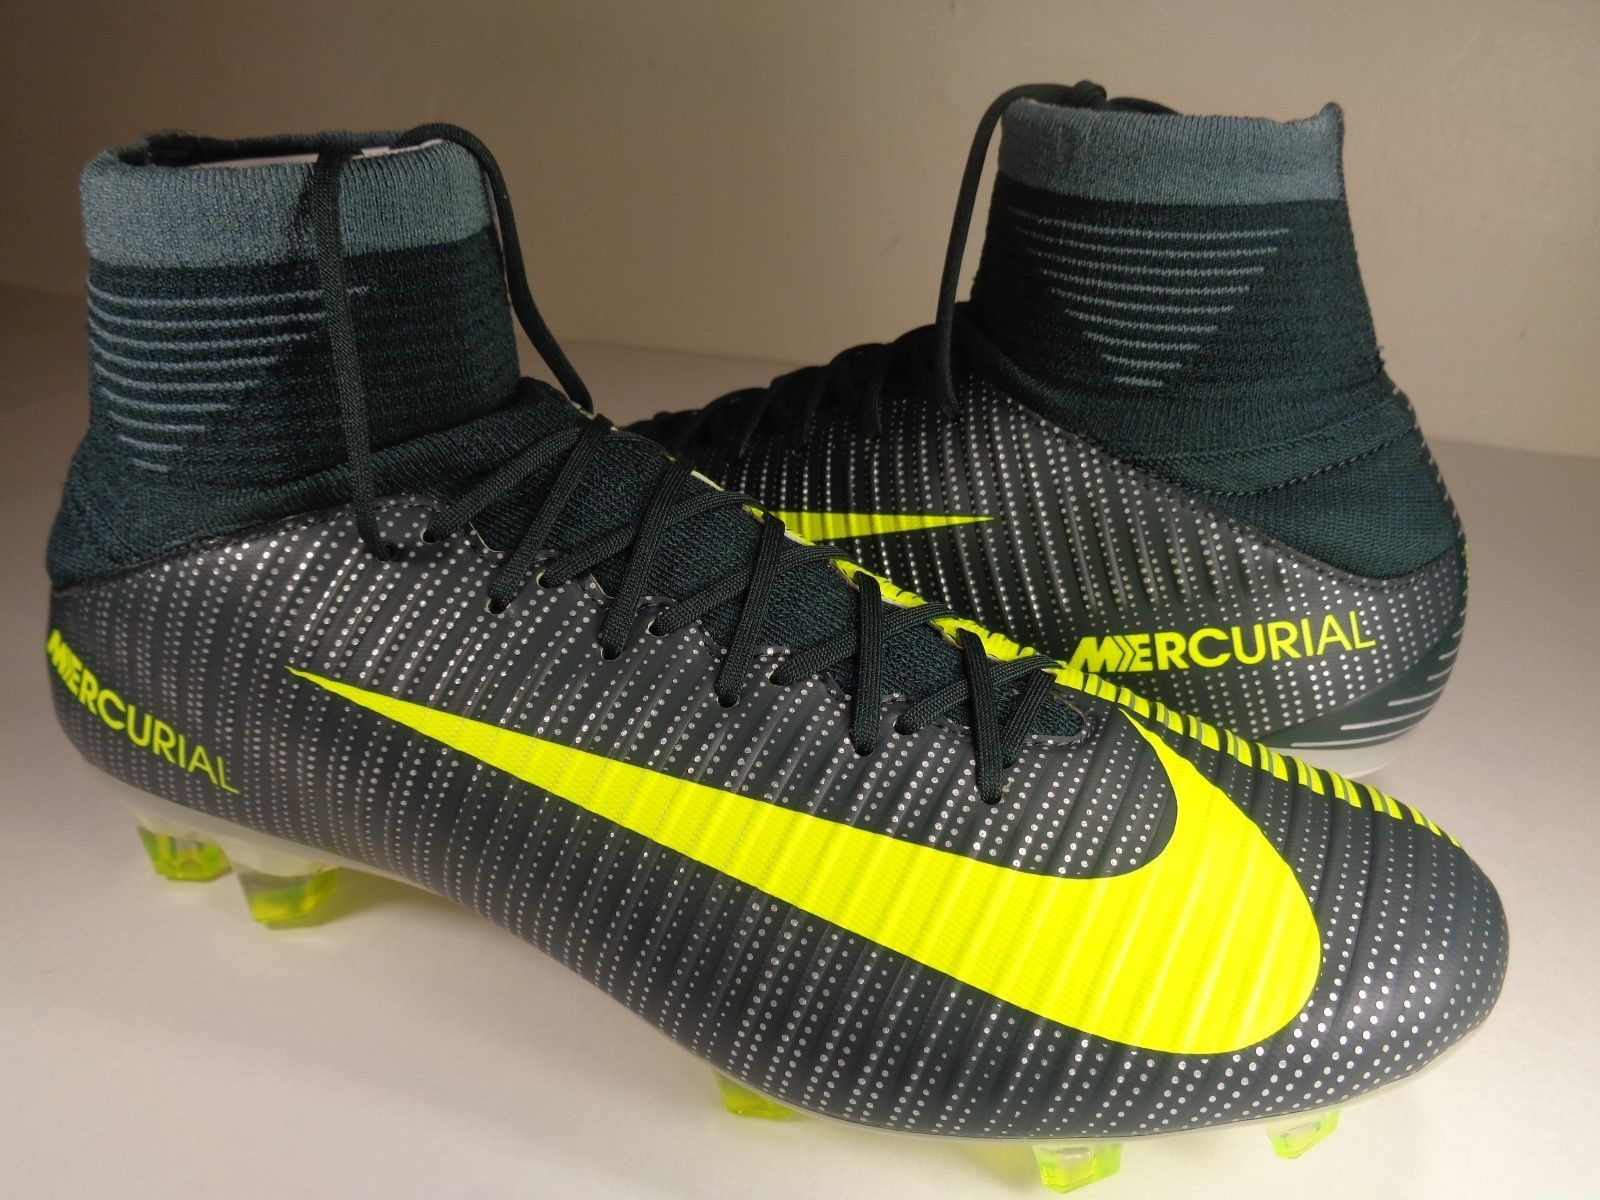 244f11219a2 Nike Mercurial Veloce III DF CR7 FG Soccer Cleat Seaweed SZ 8.5 (852518-376)